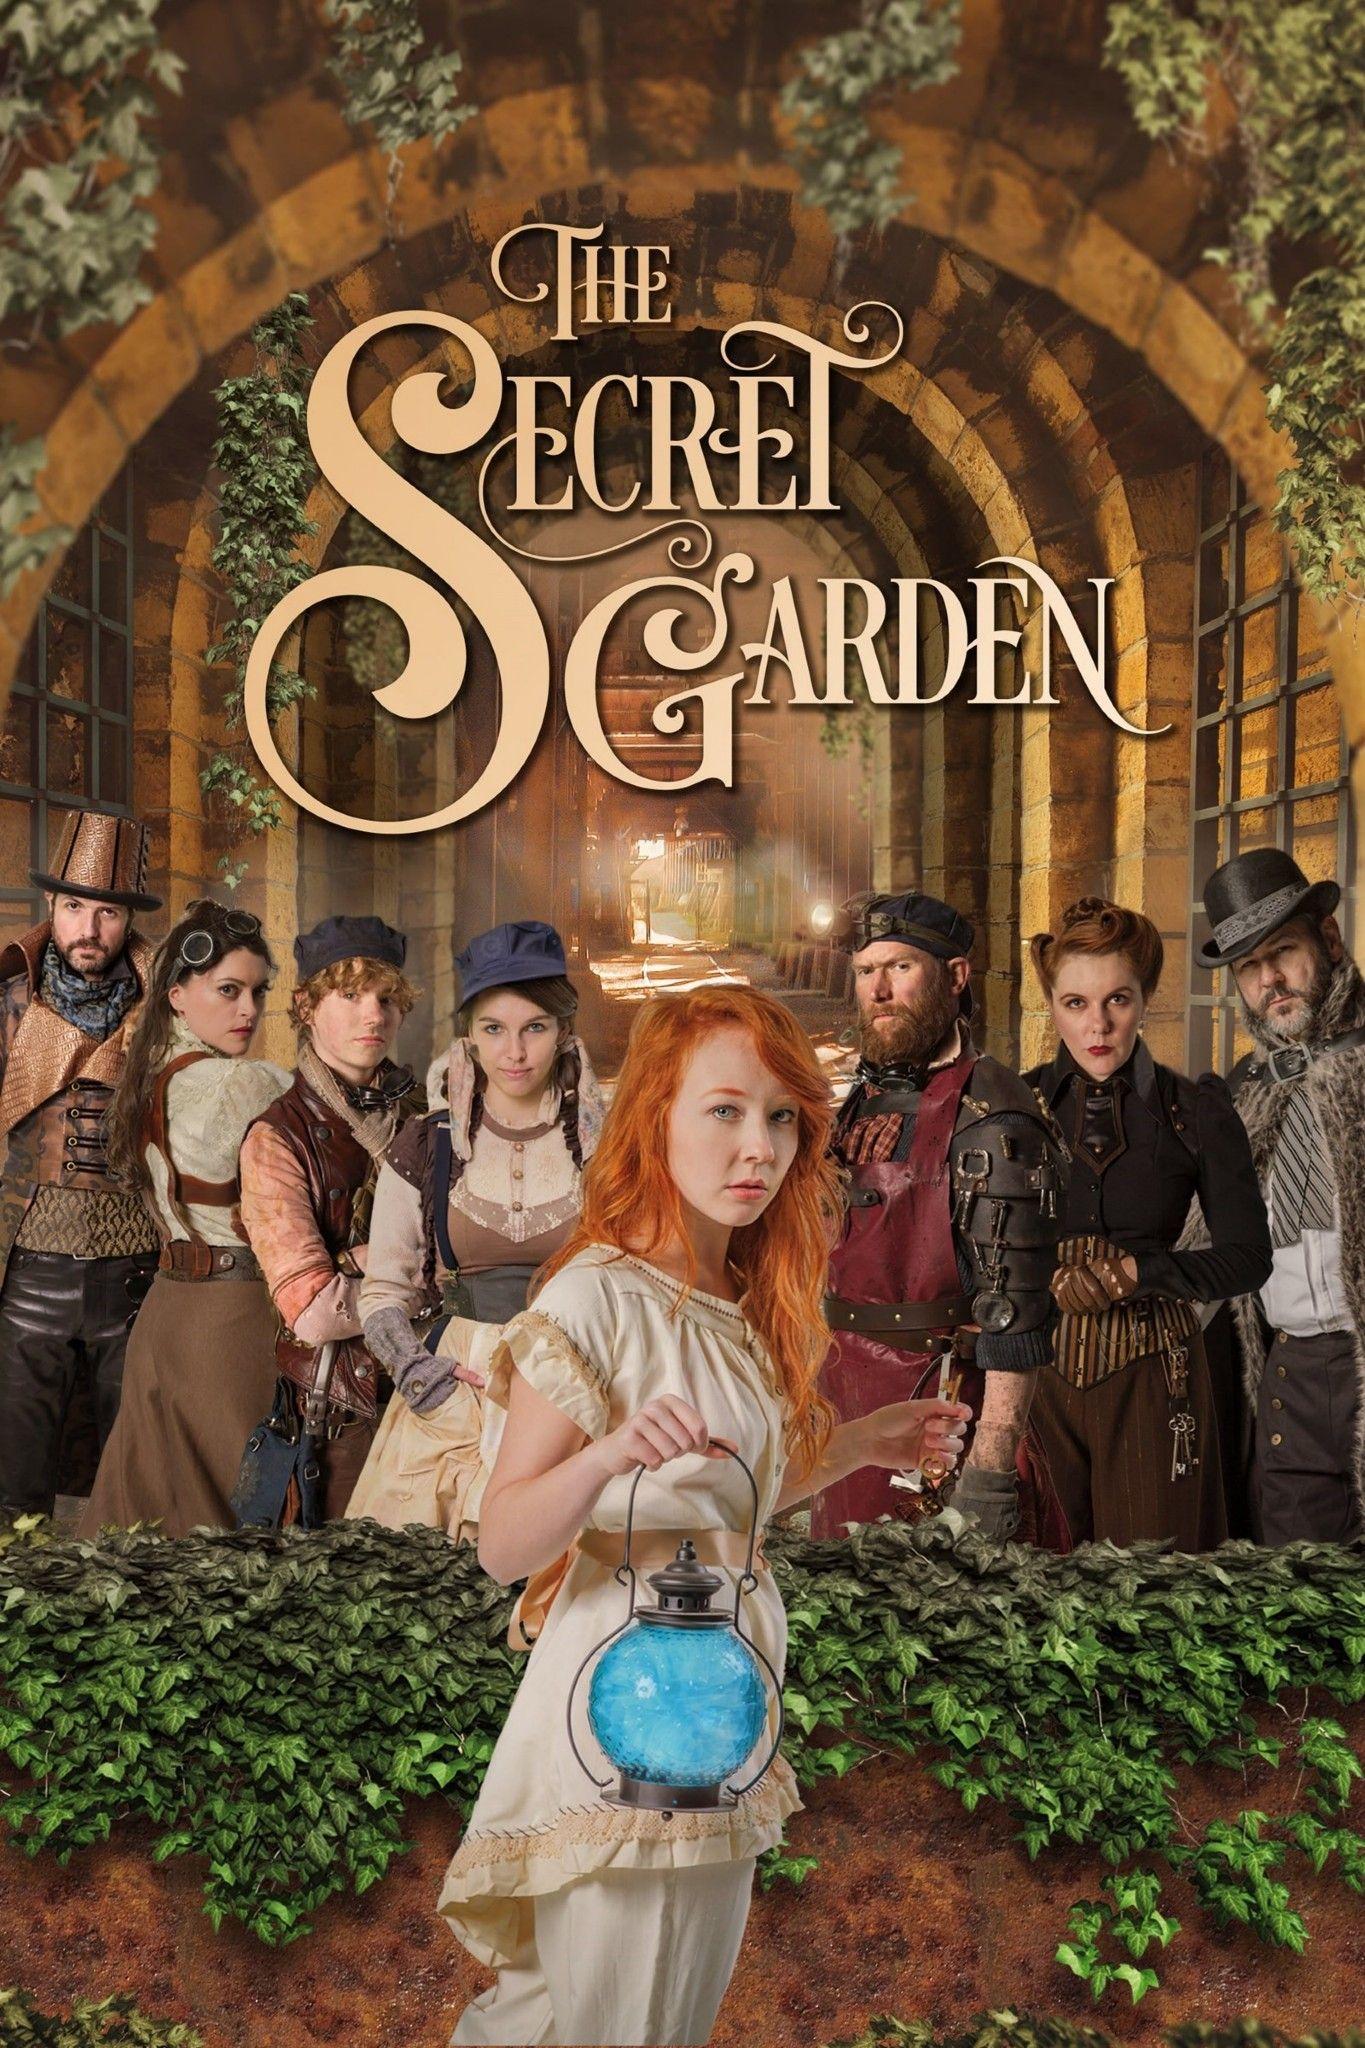 The Secret Garden 2017 Secret garden, Romantic garden